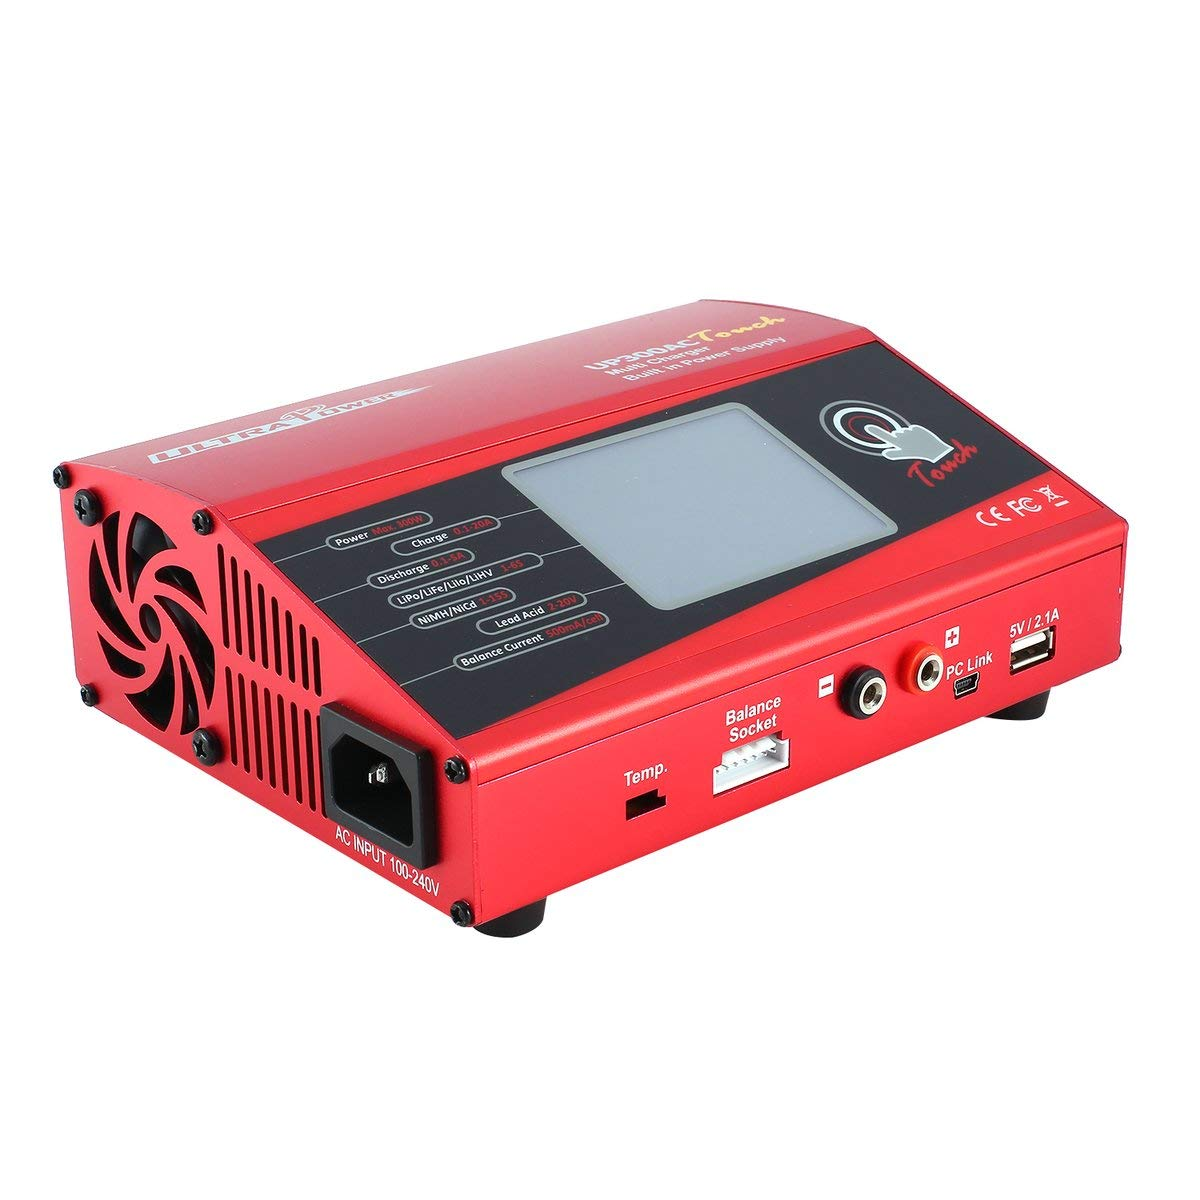 Gugutogo Ultra Power UP300AC Hochleistungs-Touch 300W 1-6S Akku-Ladegerät